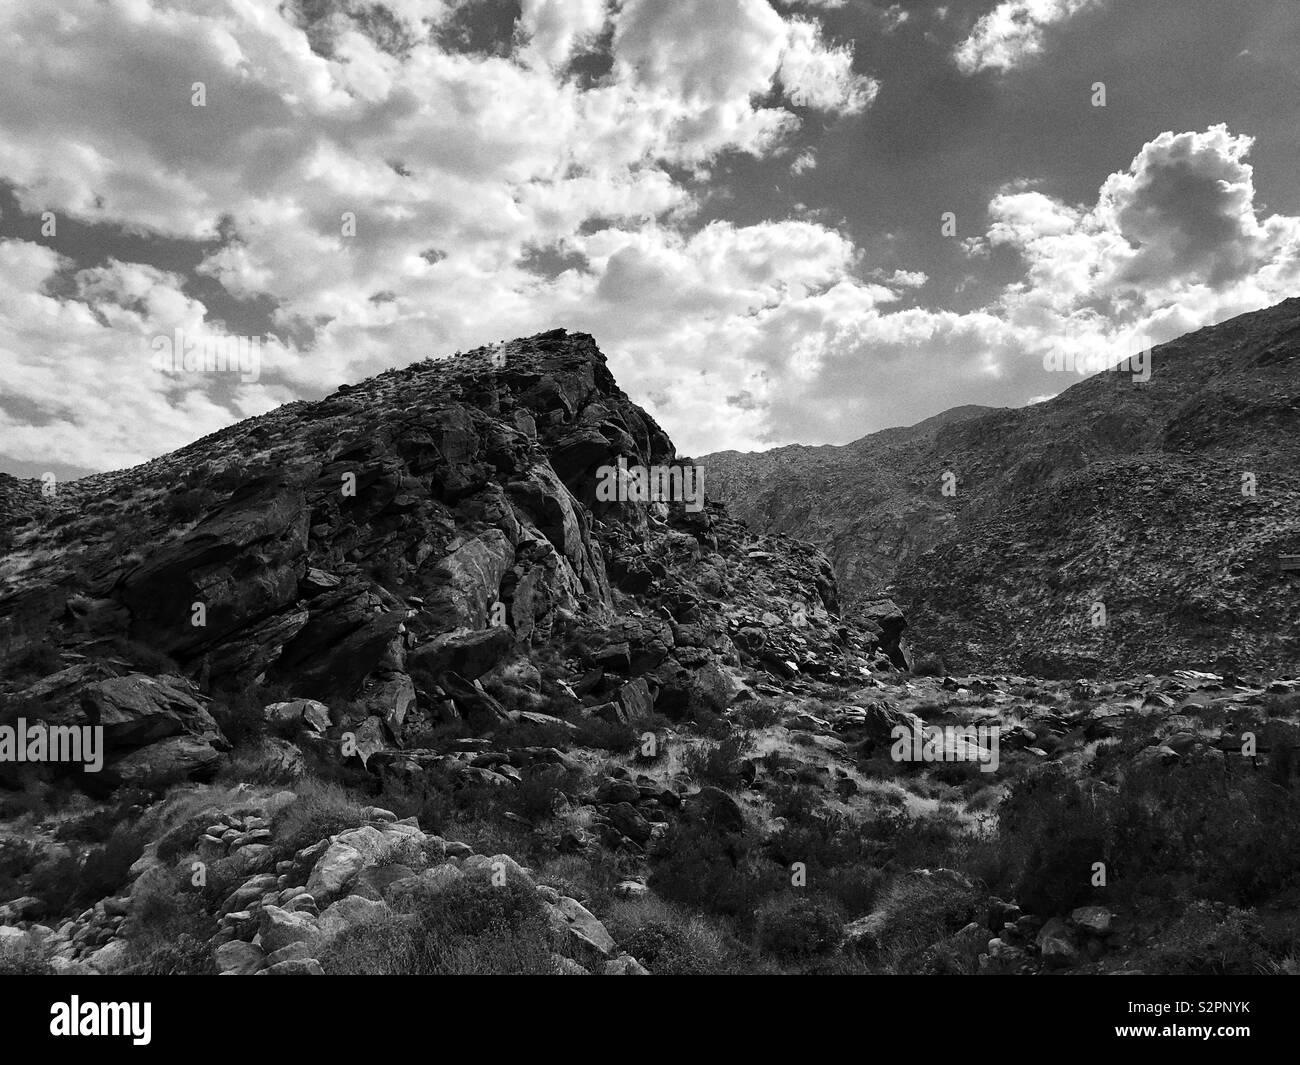 Dramatique Landscape - Stock Image